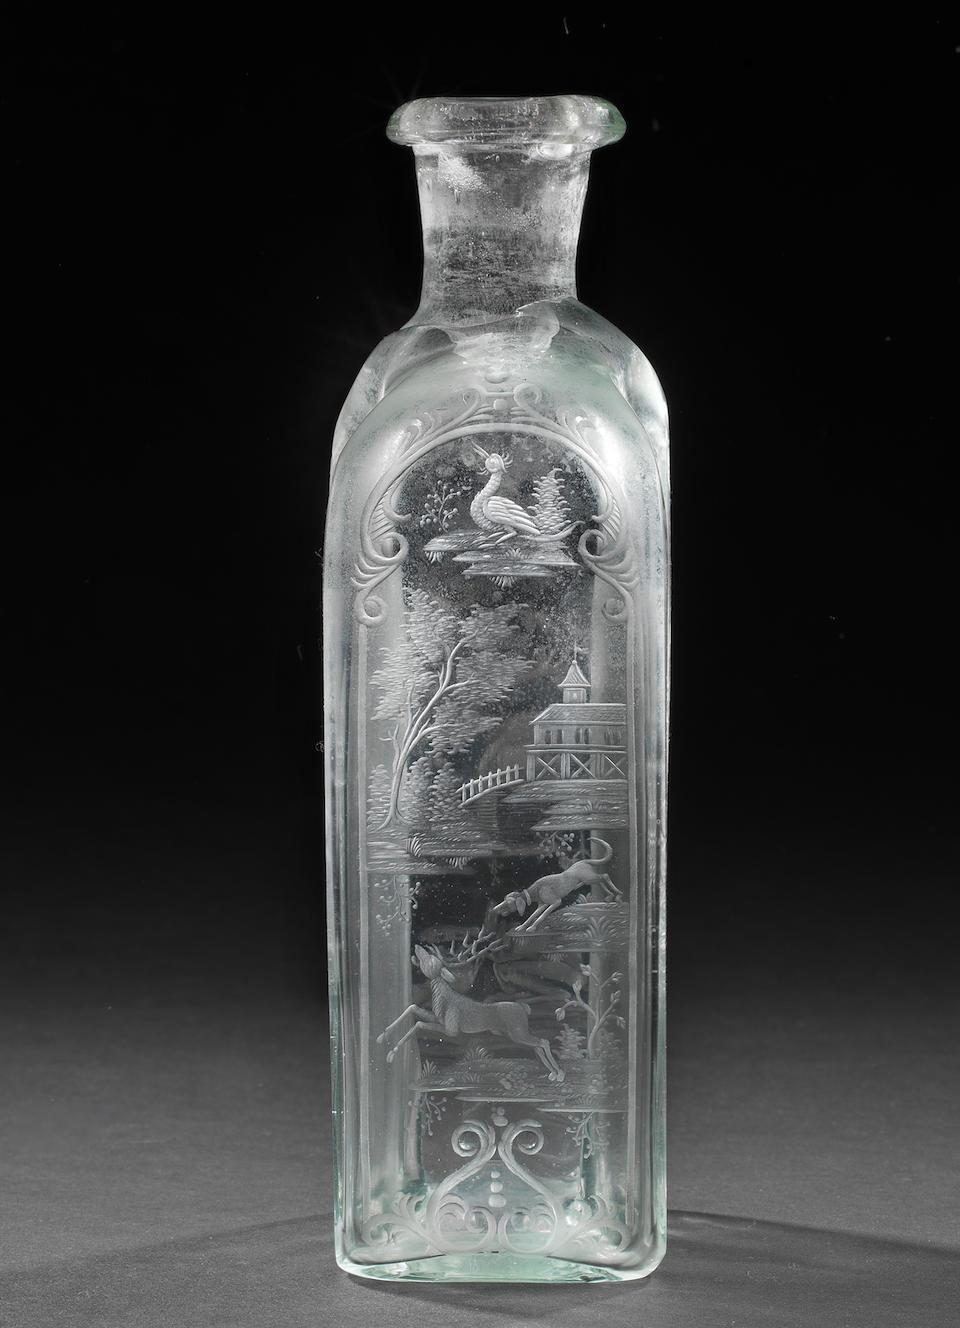 A Nuremberg engraved bottle, attributed to Anton Mäuerl, circa 1720